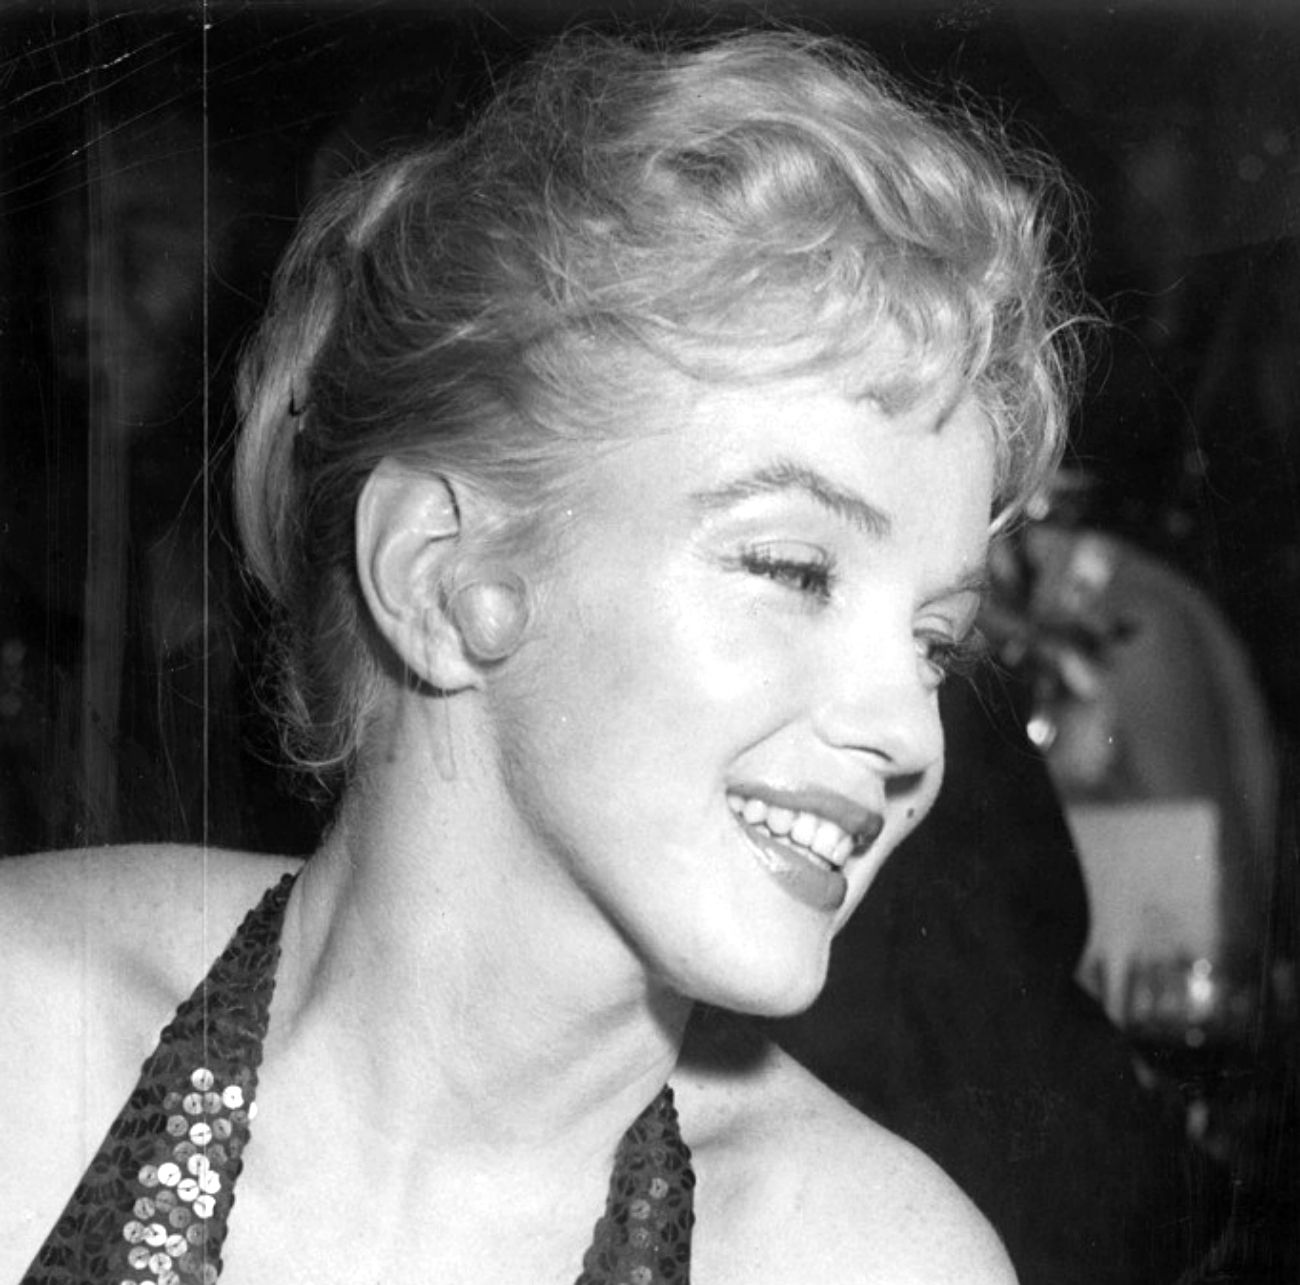 Marilyn Monroe at the April in Paris ball at the Waldorf Astoria, 1957.